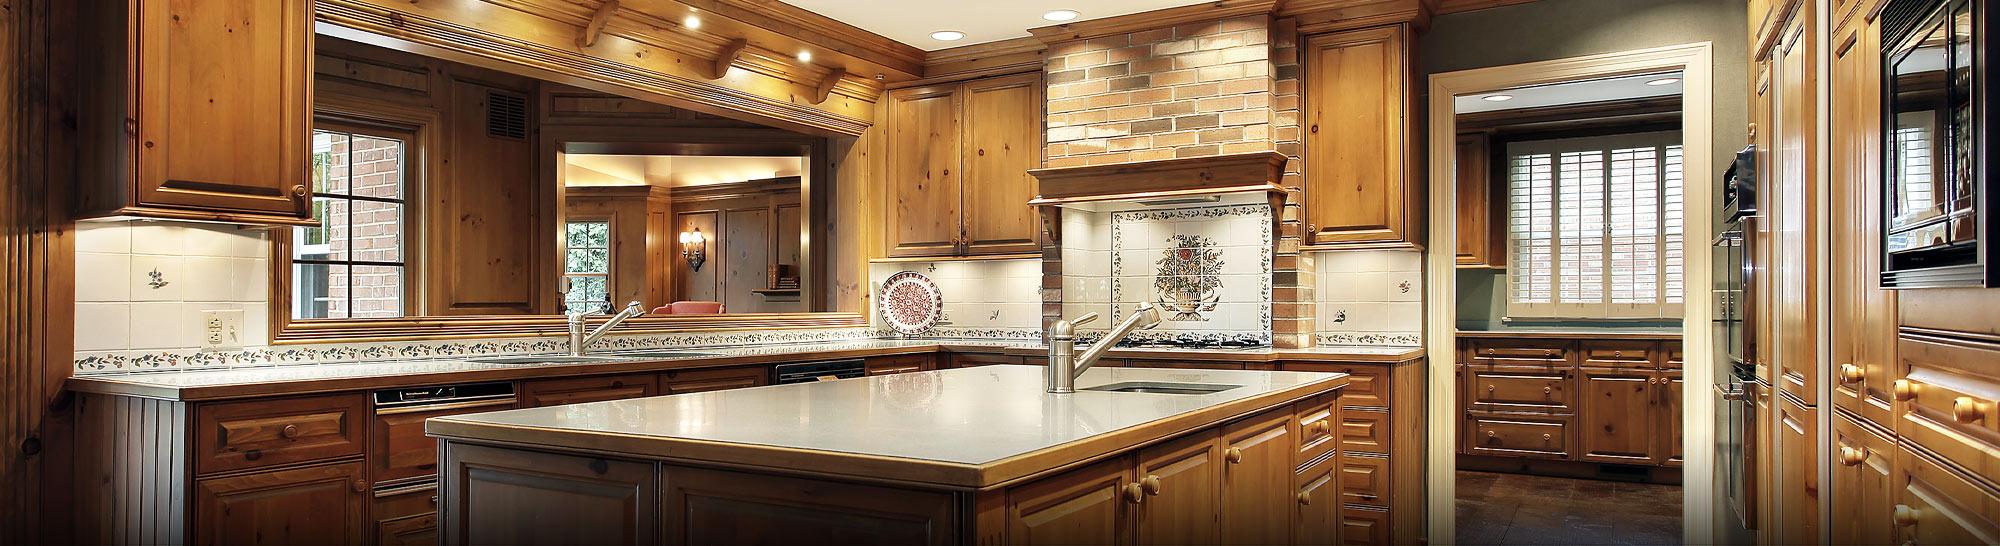 kitchen-cabinets-installation-sedona - The Wood Joint